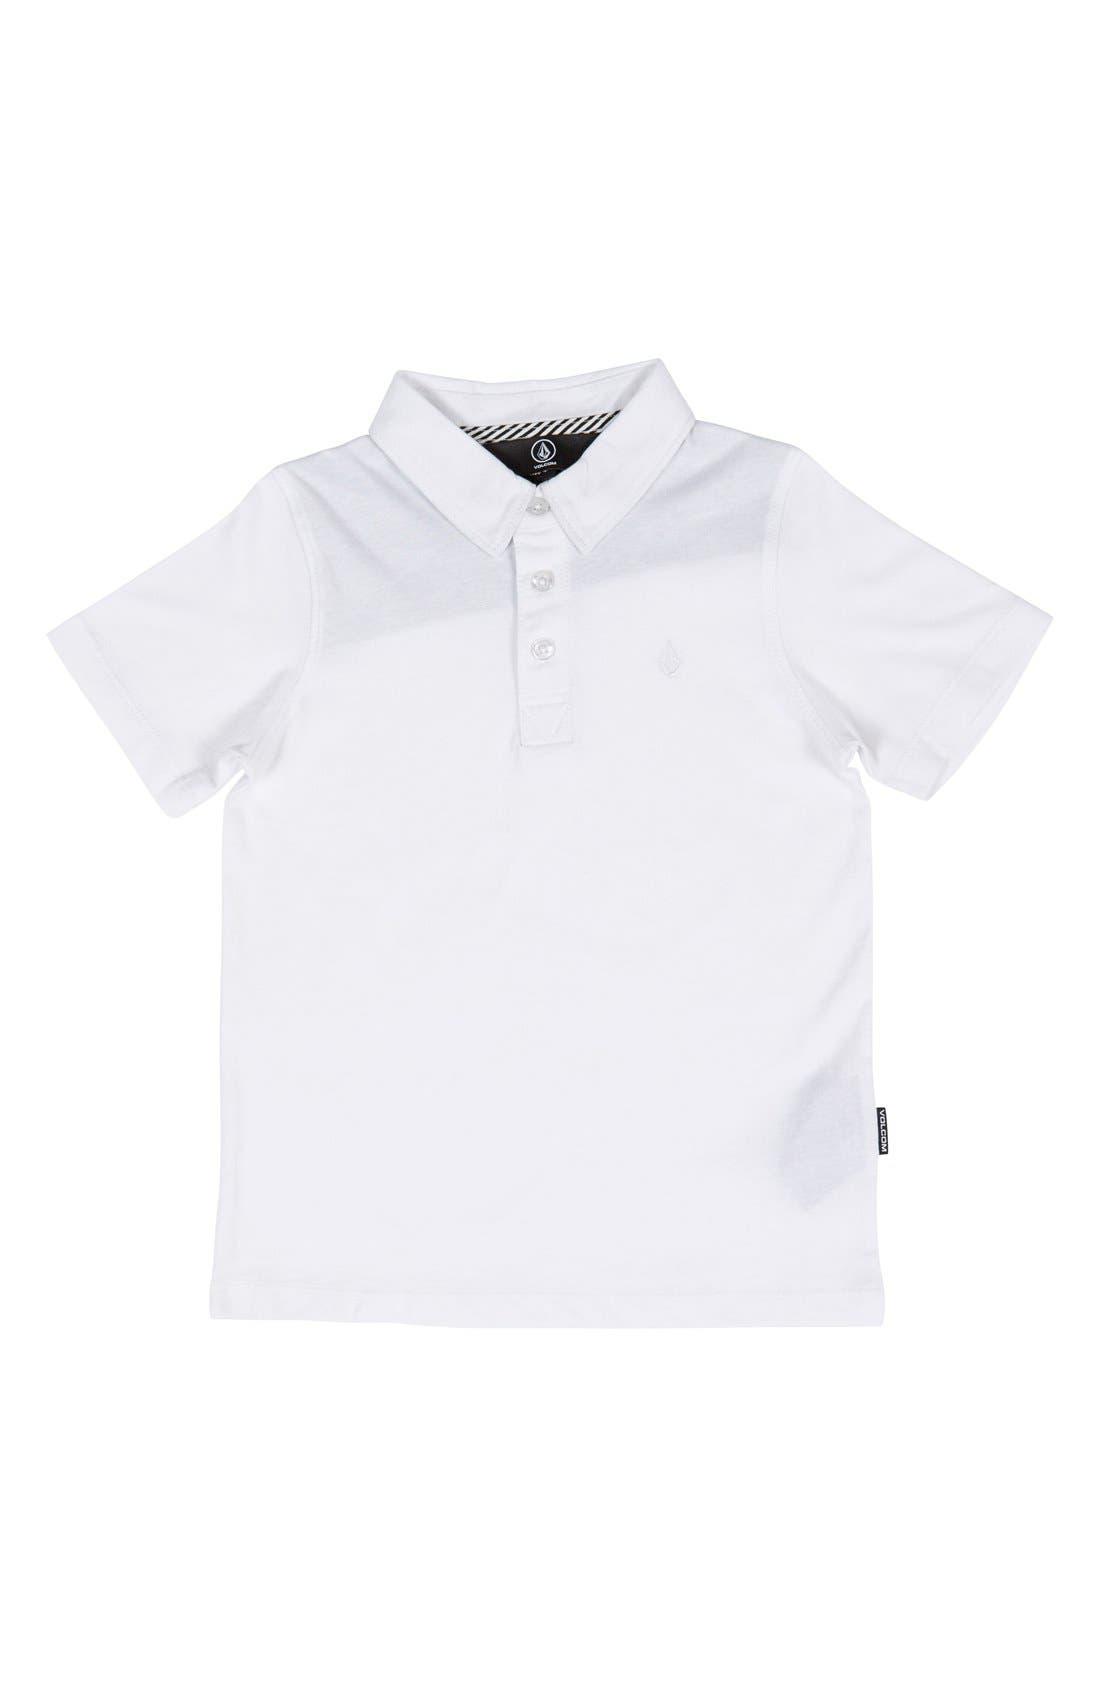 Wowzer Polo,                             Main thumbnail 1, color,                             White